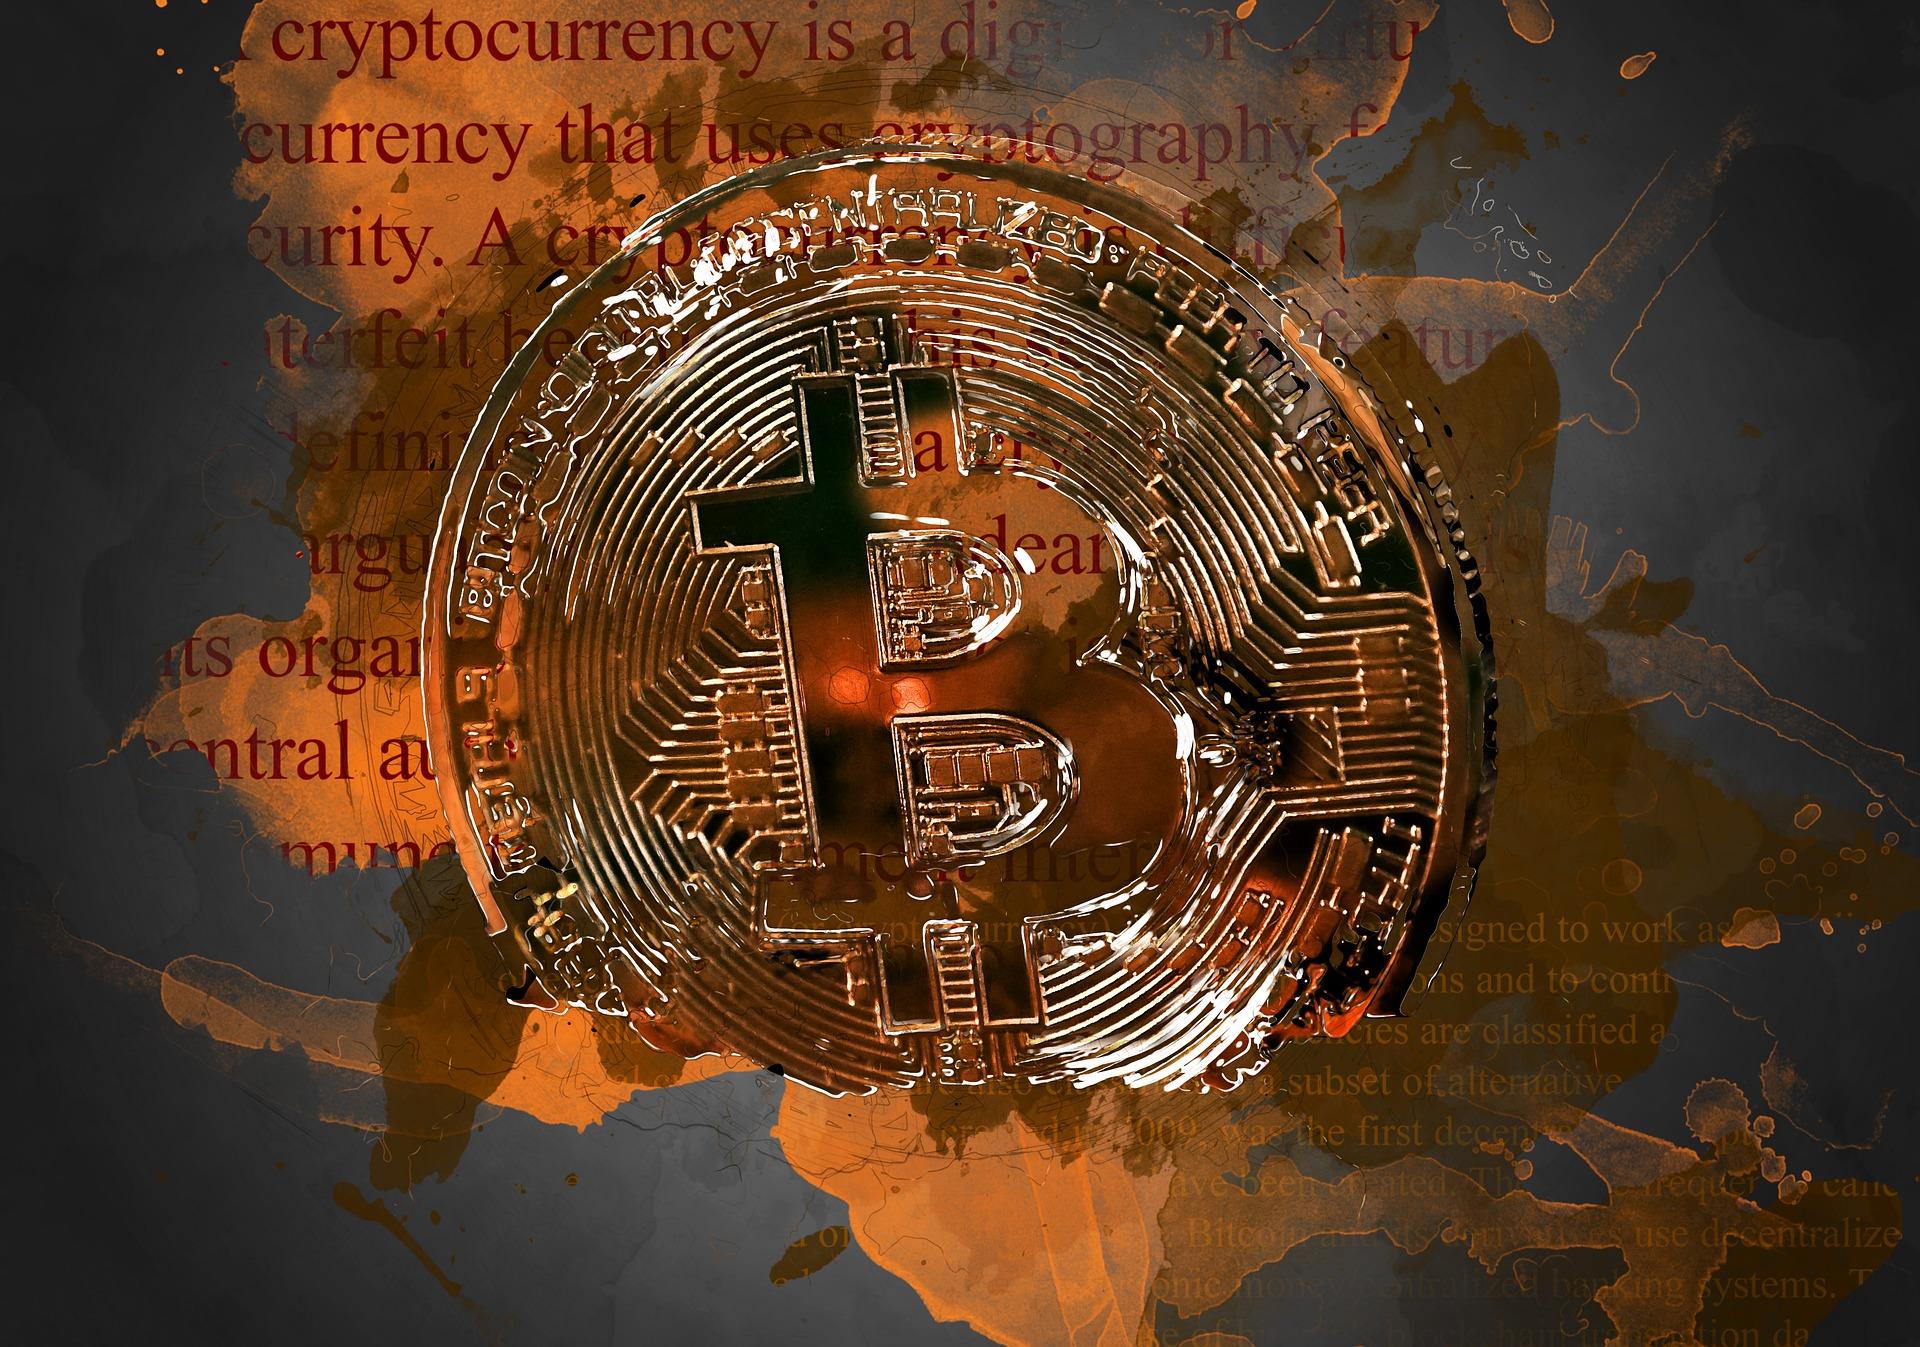 Bären zogen bei Bitcoin Revolution Unterstützung